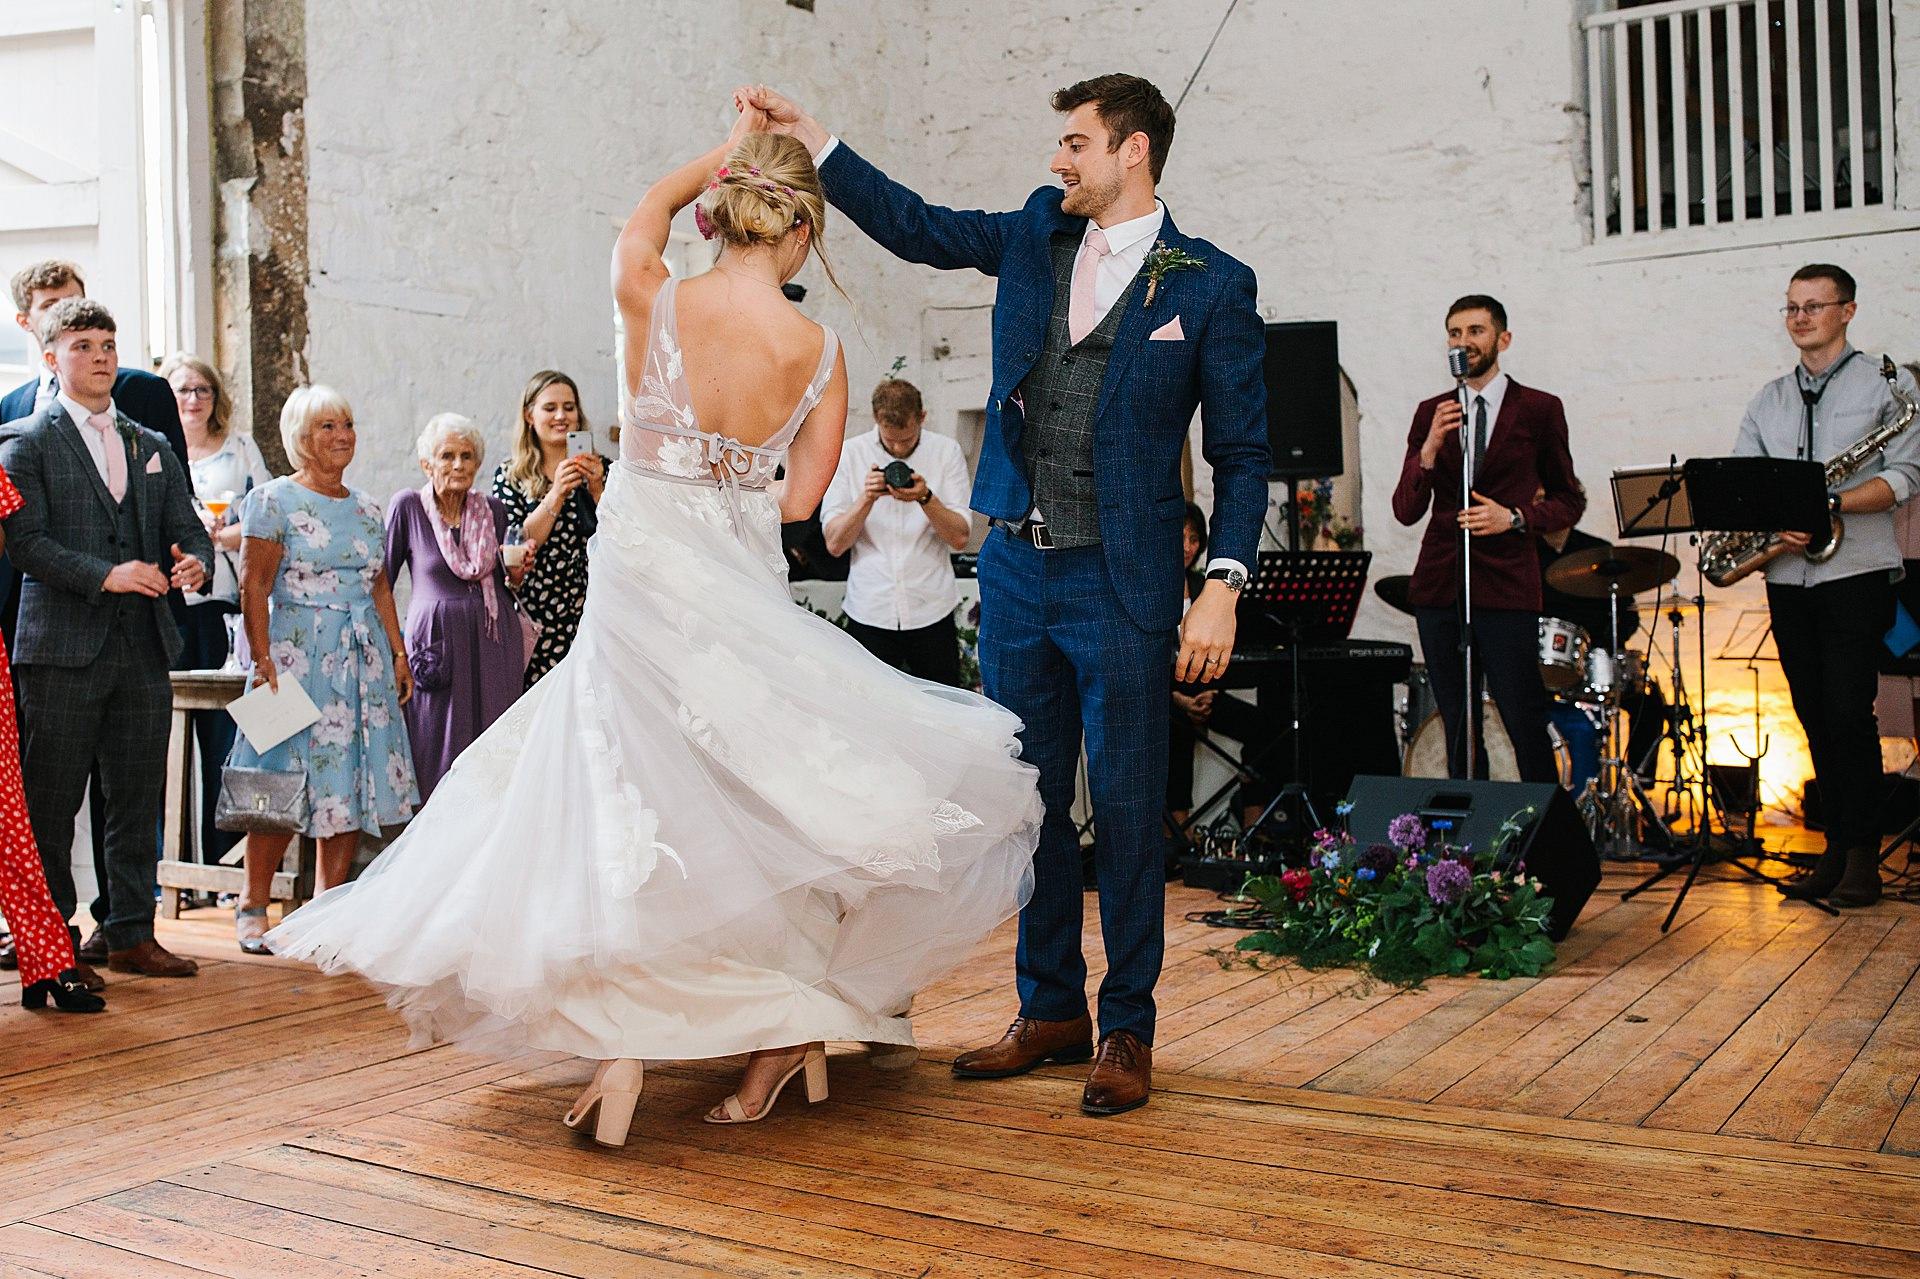 Birde and Bridesmaids dancing at the wedding photography